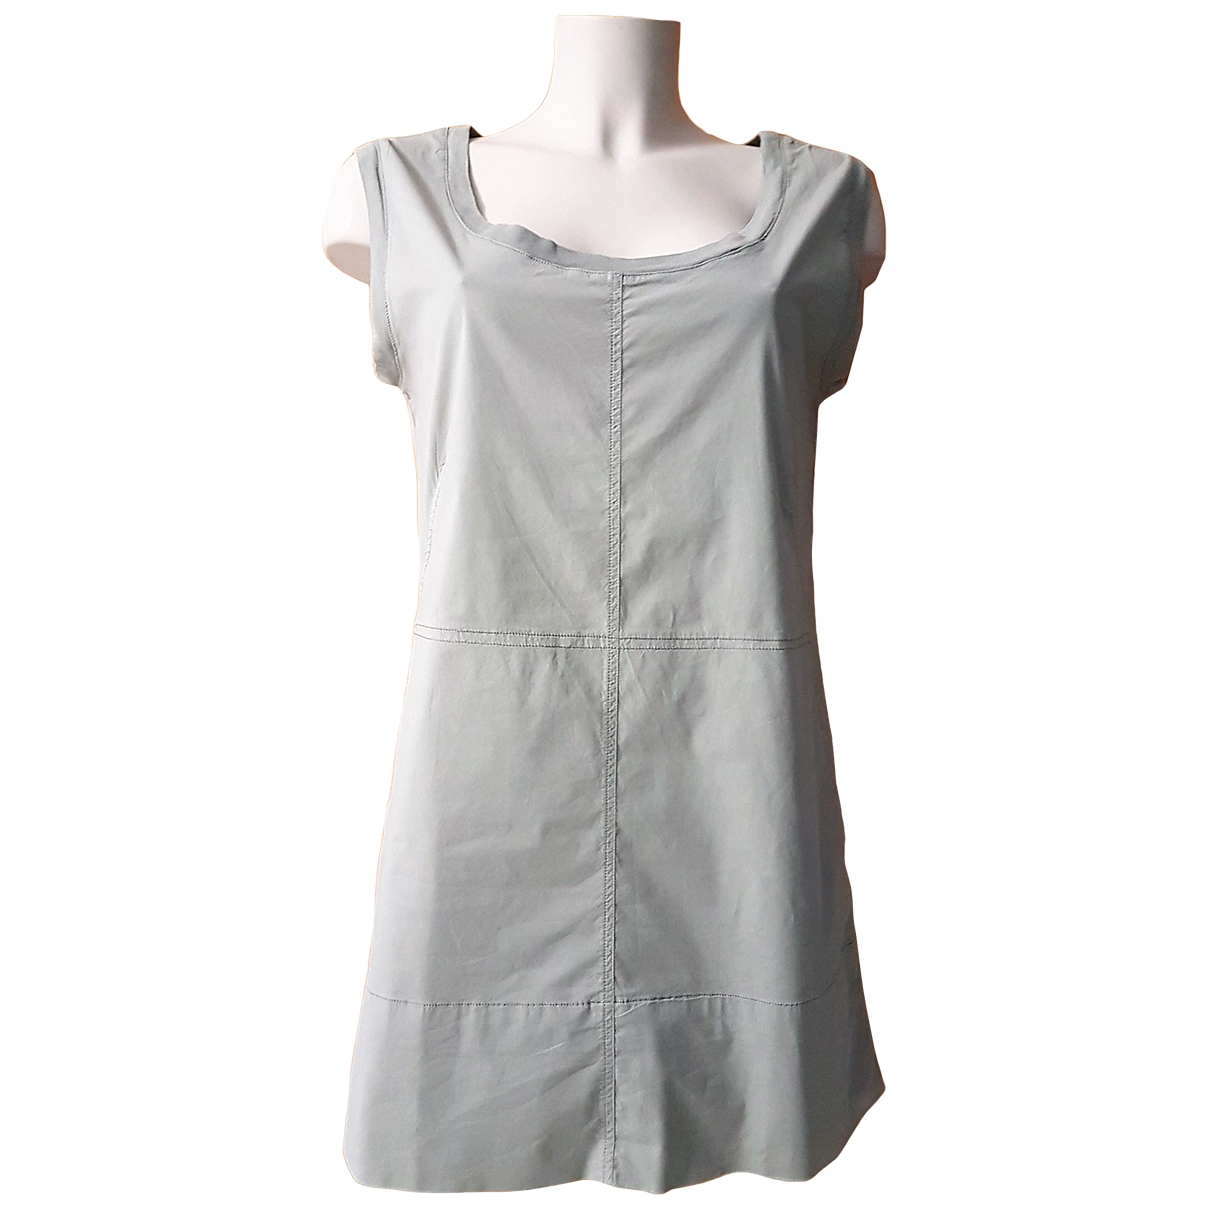 Kristensen Du Nord \N Kleid in  Grau Baumwolle